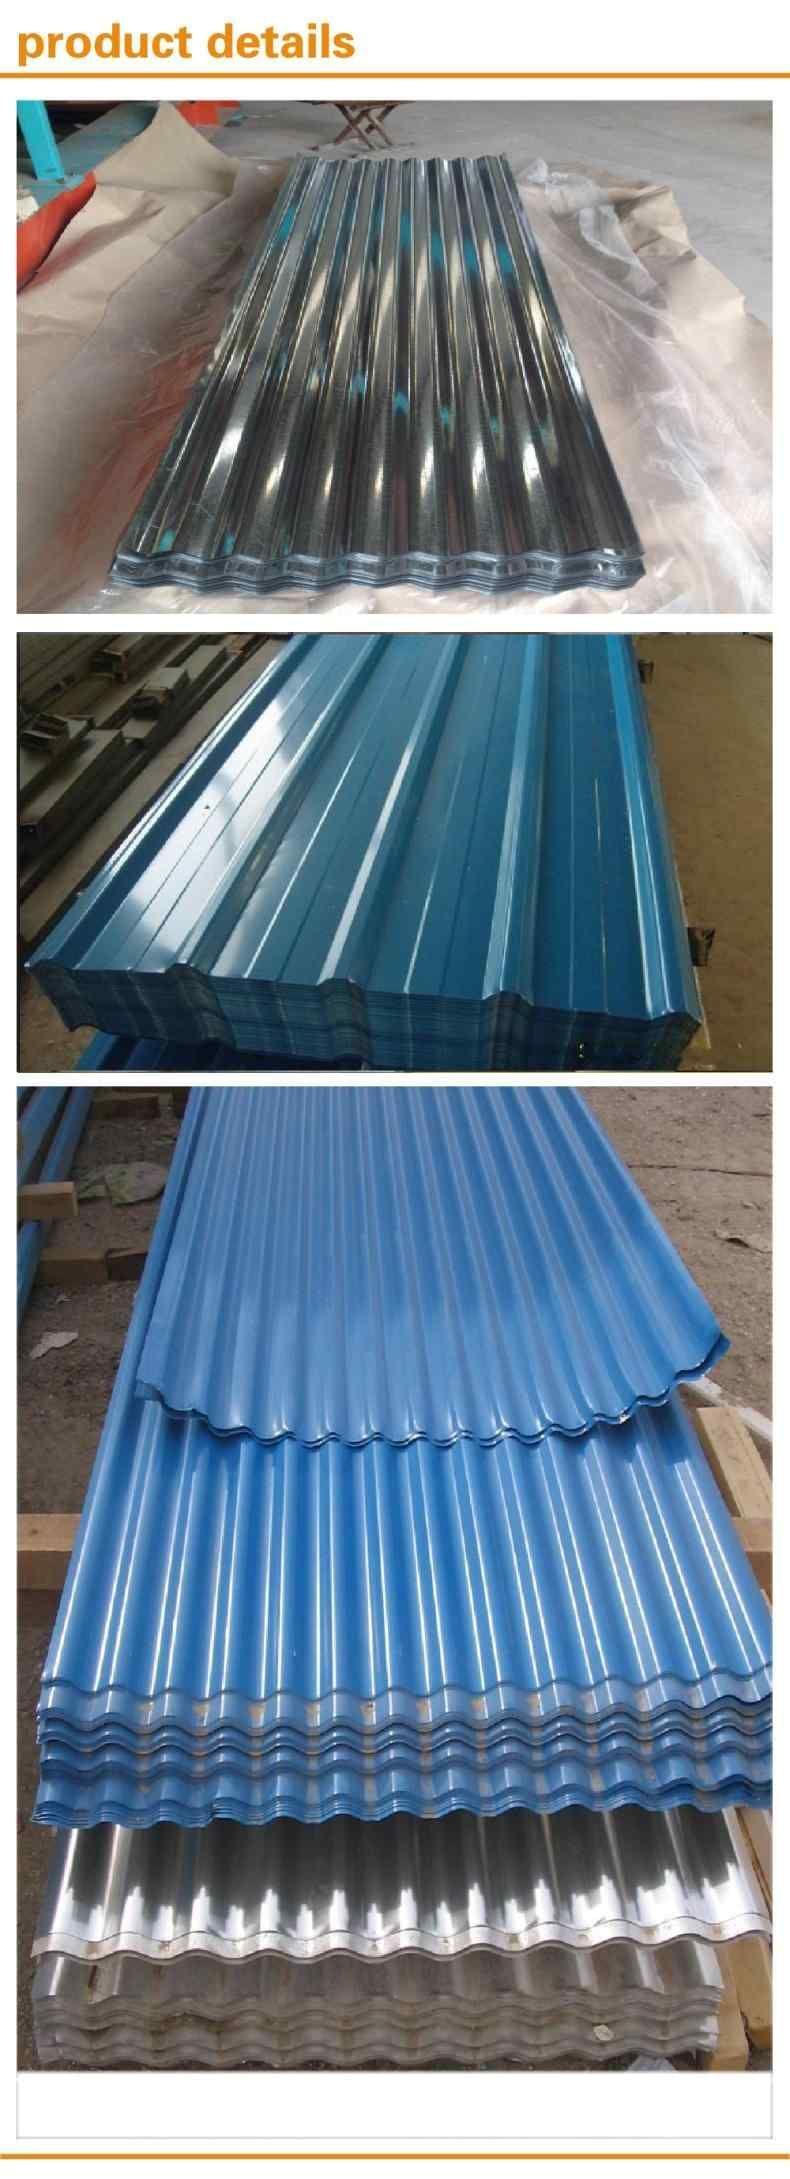 Metal Roofing Brands Metal roof, Roofing, Roof design